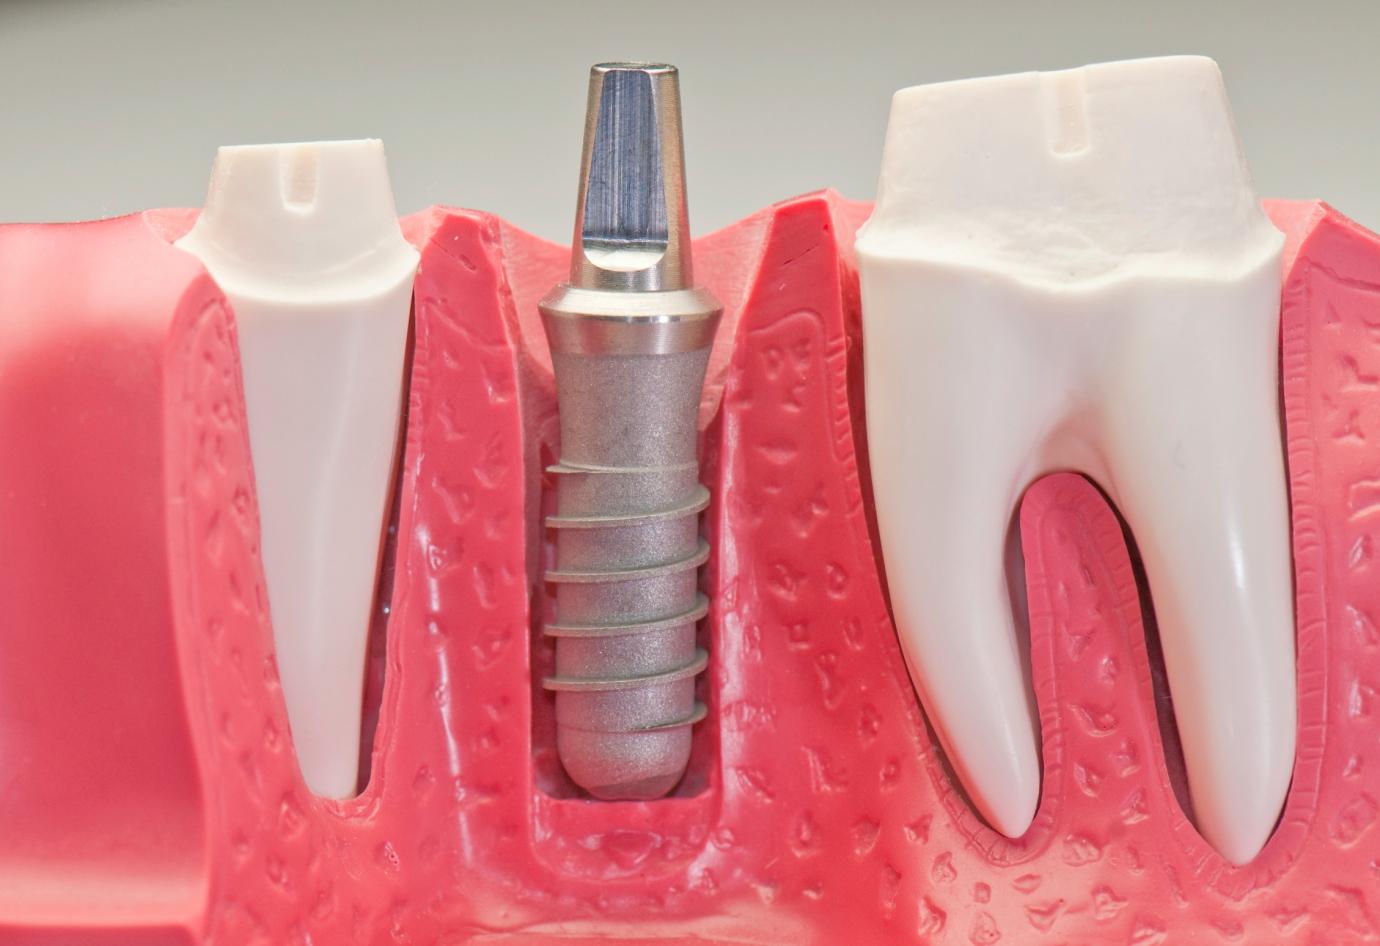 oral implants